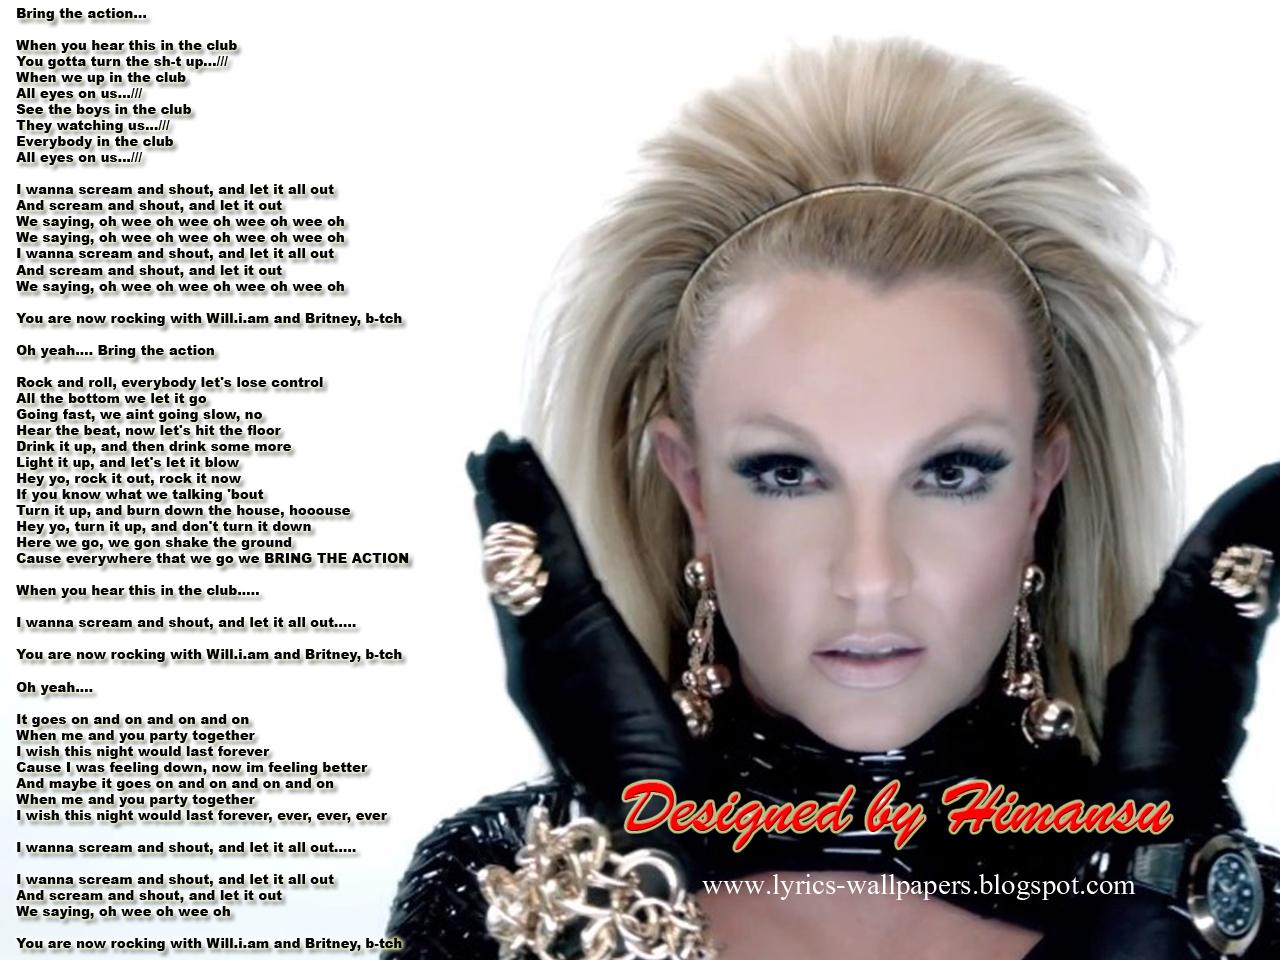 http://2.bp.blogspot.com/-SUo-domGoh8/UOCpEk9dDqI/AAAAAAAAAmA/3s0AIfviqJc/s1600/Scream+&+Shout....jpg